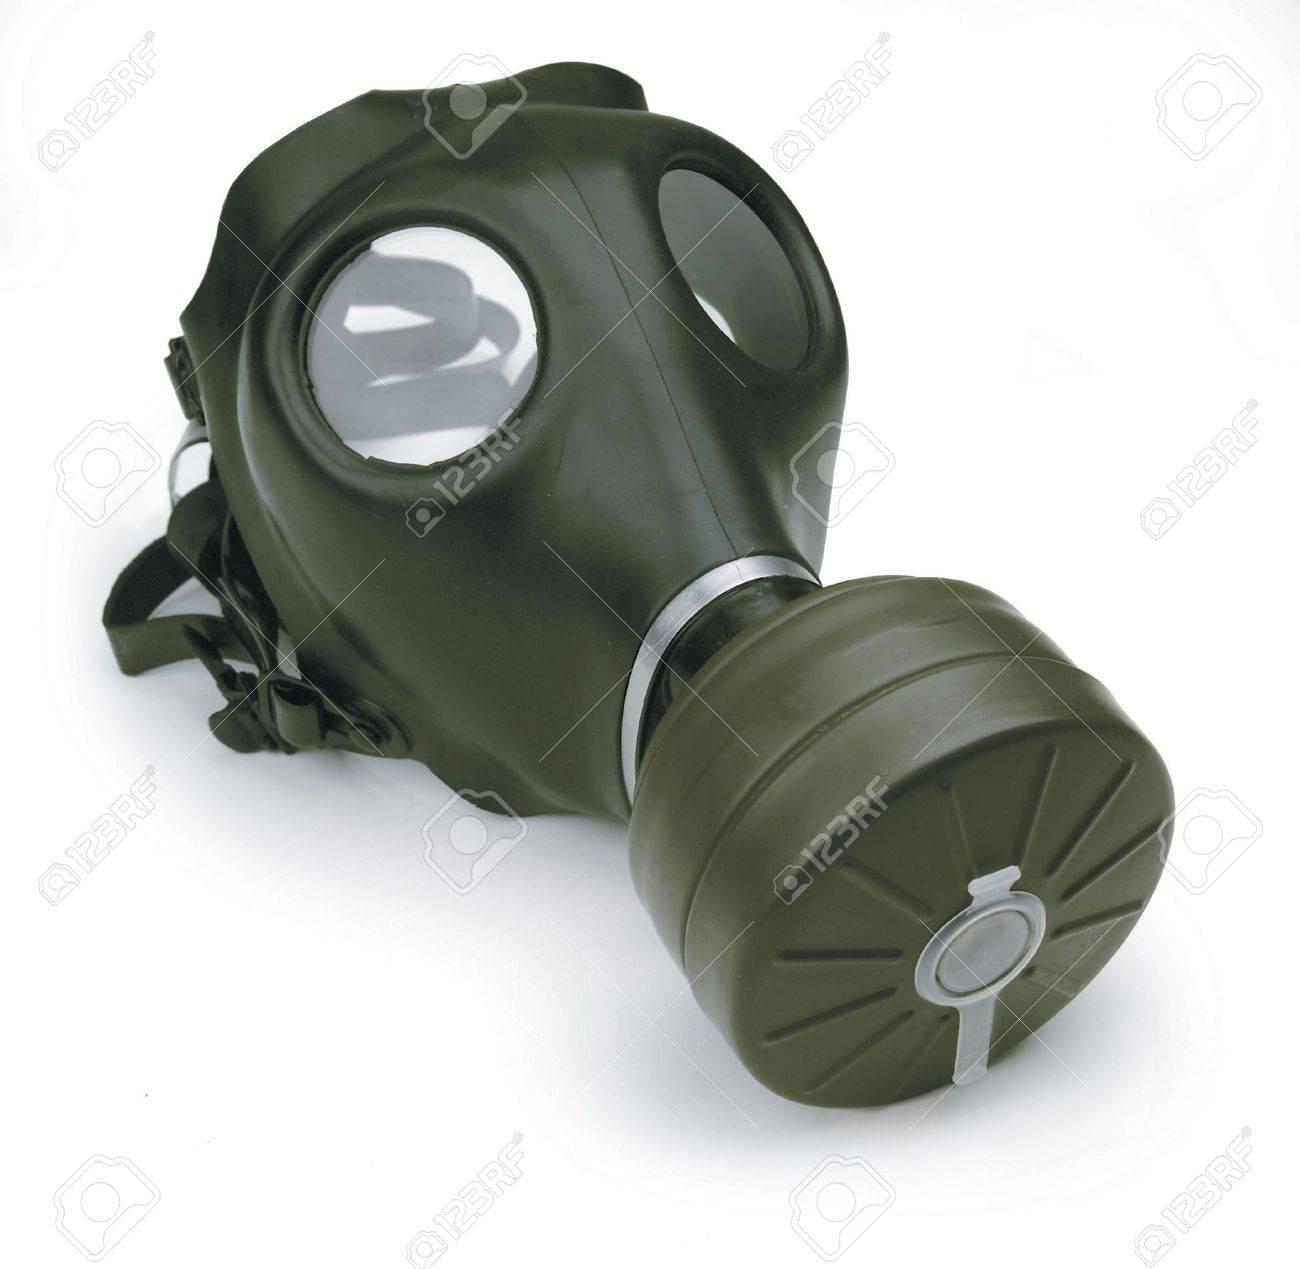 gas mask on white background Stock Photo - 7049169